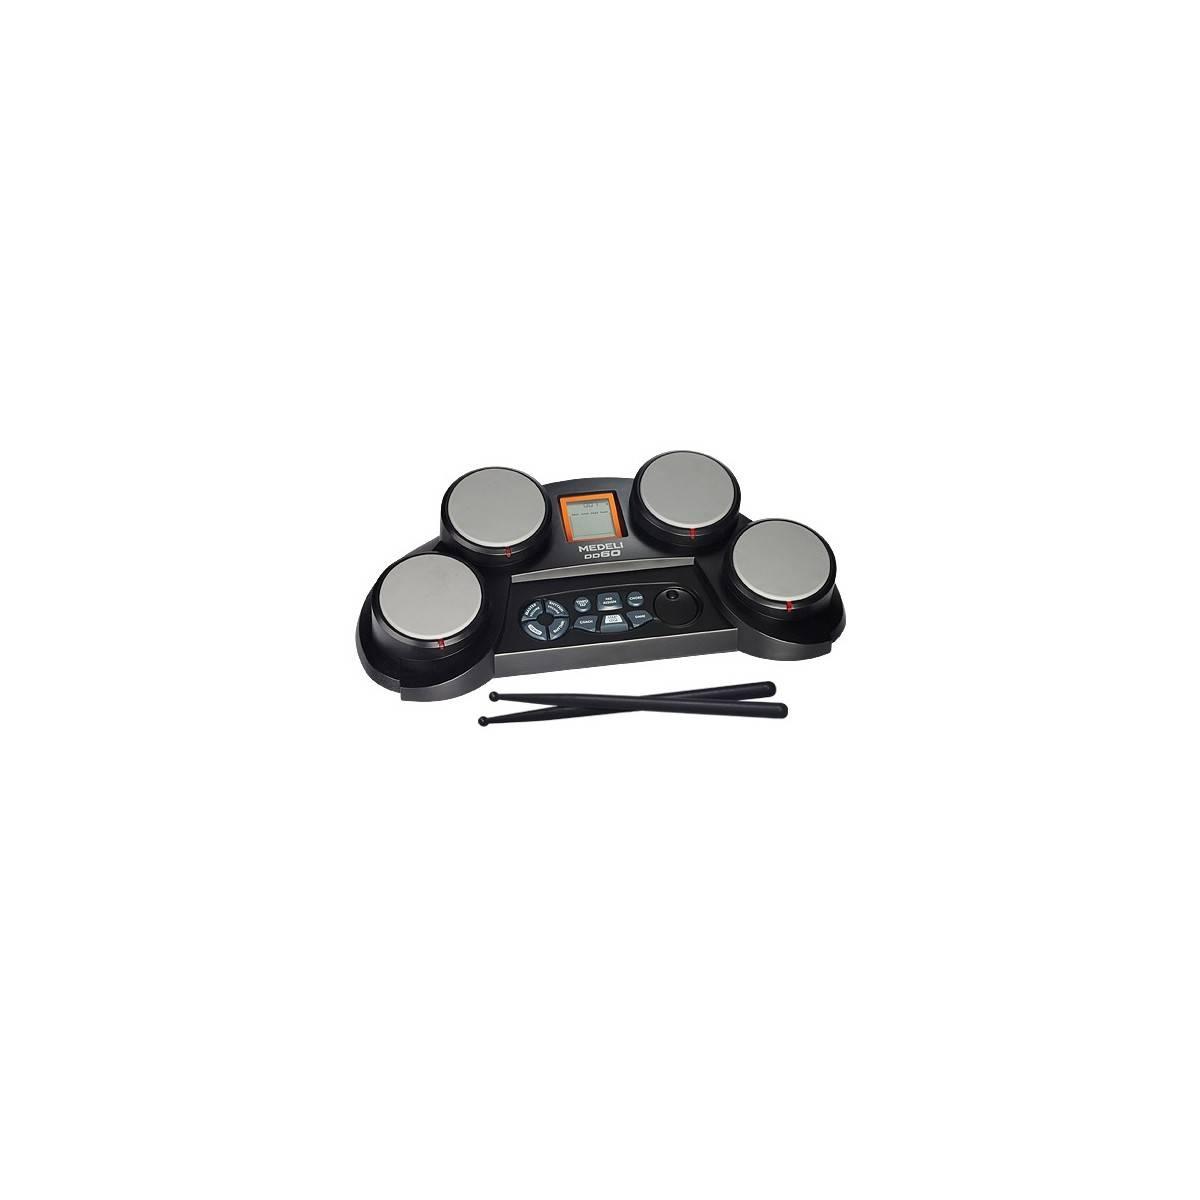 batterie electronique compacte dd60 neuf ebay. Black Bedroom Furniture Sets. Home Design Ideas